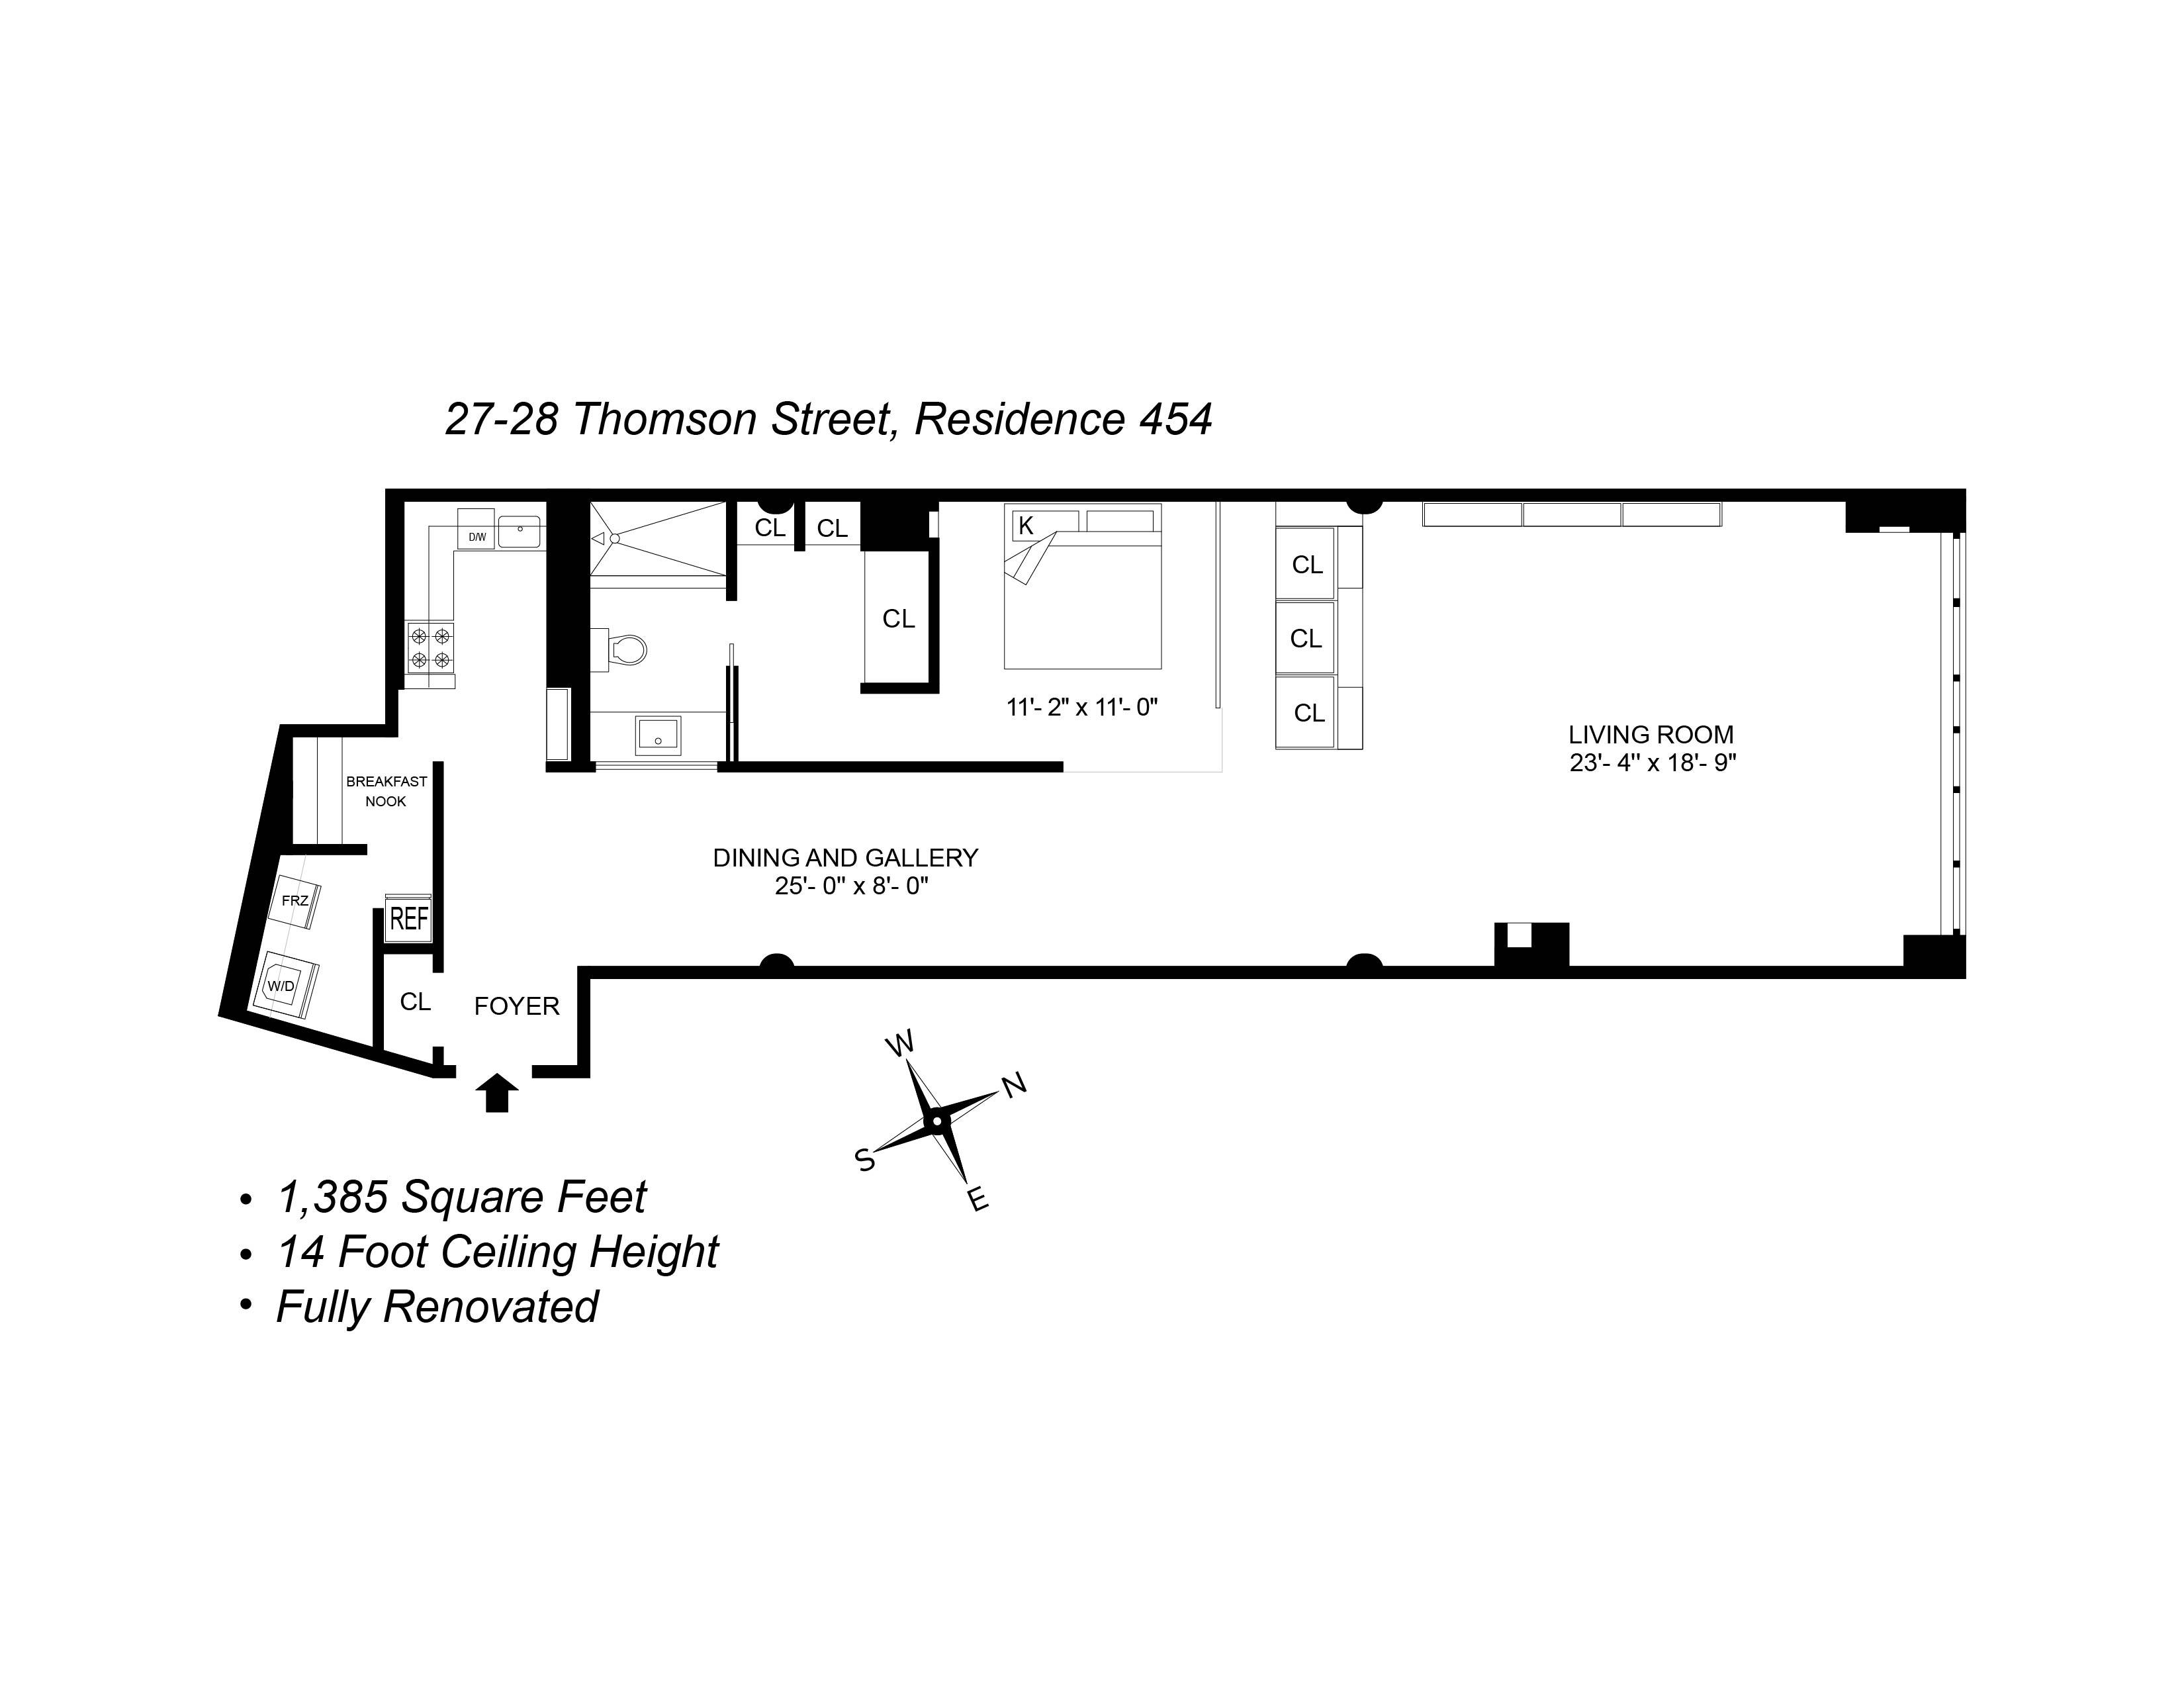 27-28 Thomson Avenue Court Square Queens NY 11101